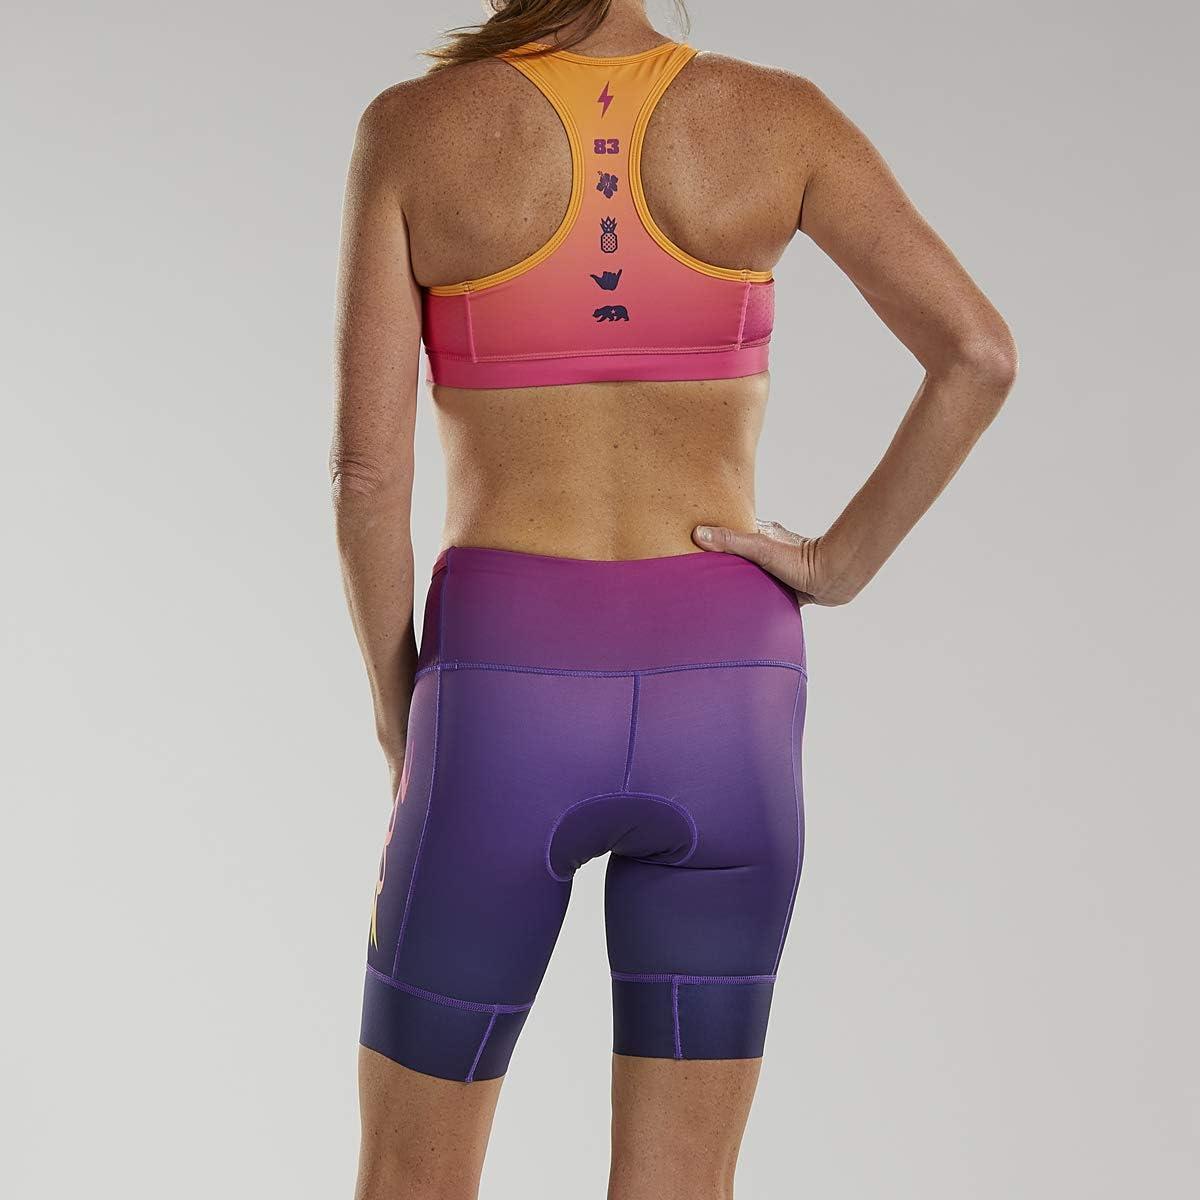 Zoot Damen LTD Triathlon 8 Inch Hose Plus Style Sunset W LTD Tri 8 Inch Short Plus Sunset